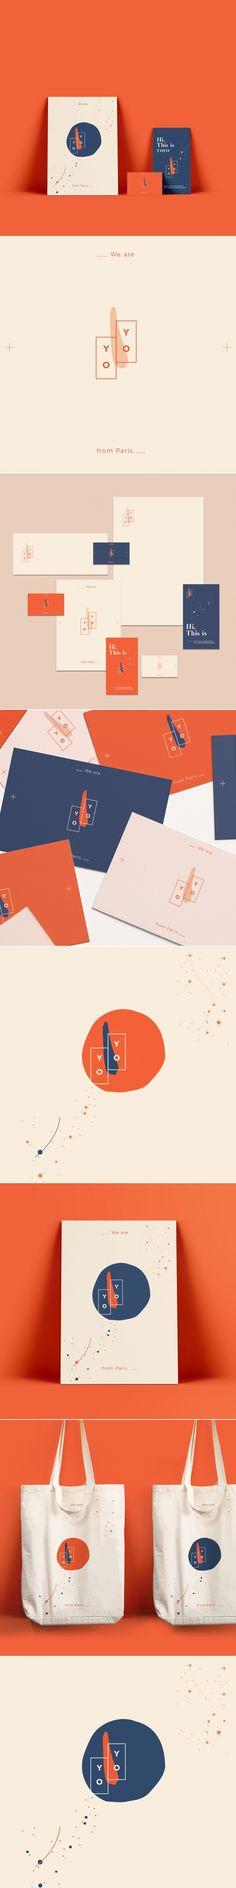 YoYo – Fivestar Branding Agency YoYo boutique agency brand identity by Cecilia Melli Studio Corporate Design, Brand Identity Design, Design Agency, Logo Design, Massimo Vignelli, Branding Agency, Logo Branding, Layout Design, Graphic Design Brochure